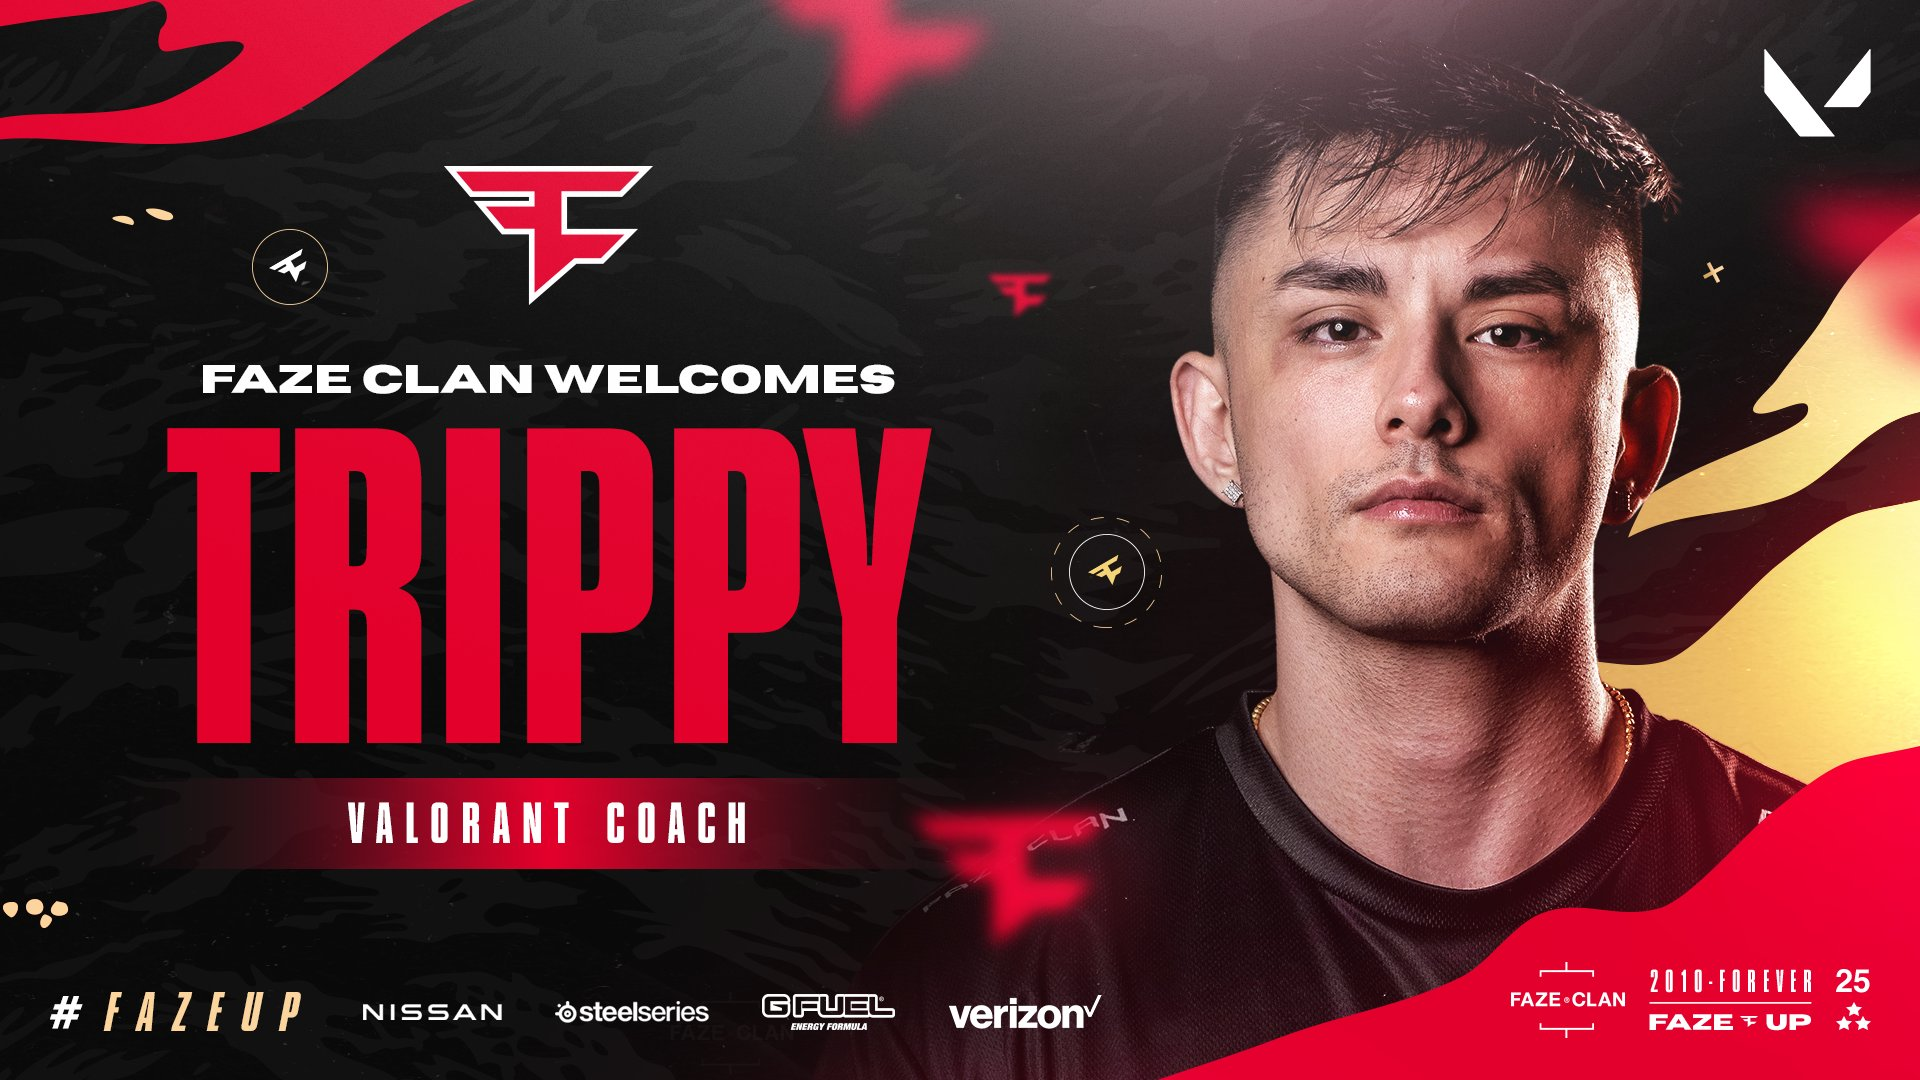 FaZe Clan sign Trippy as team's new head coach